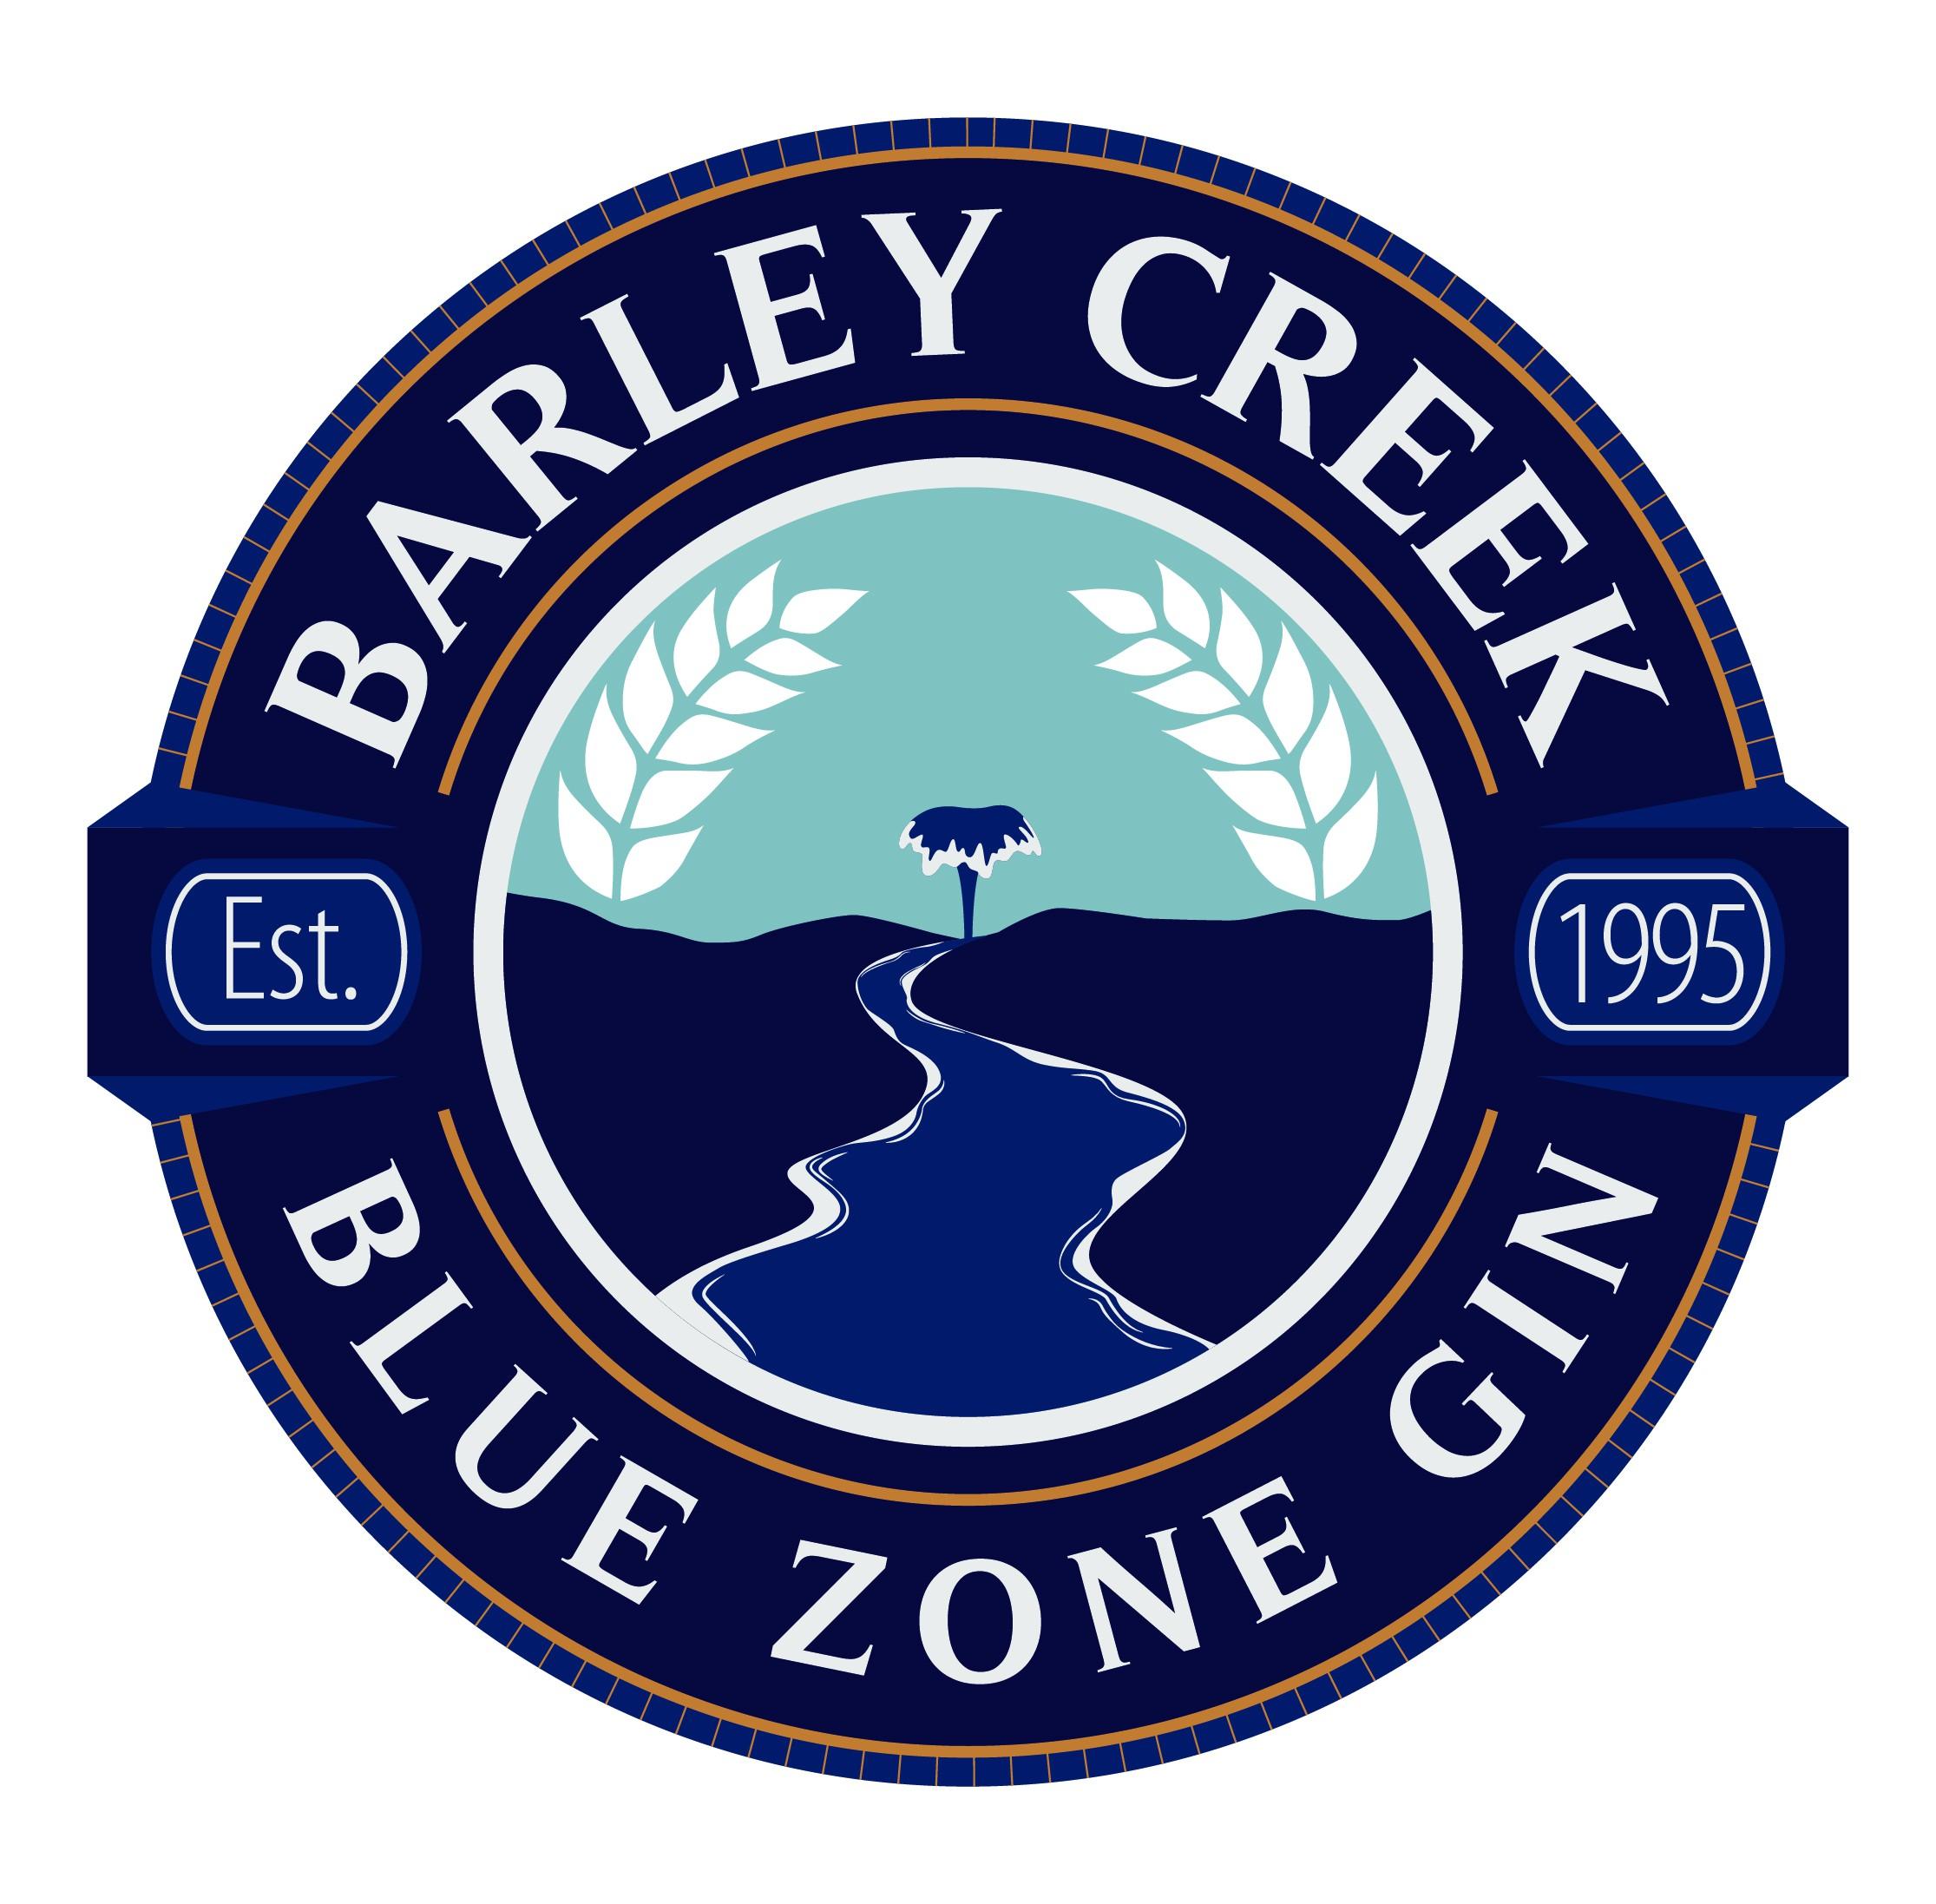 Barley Creek Blue Zone Gin